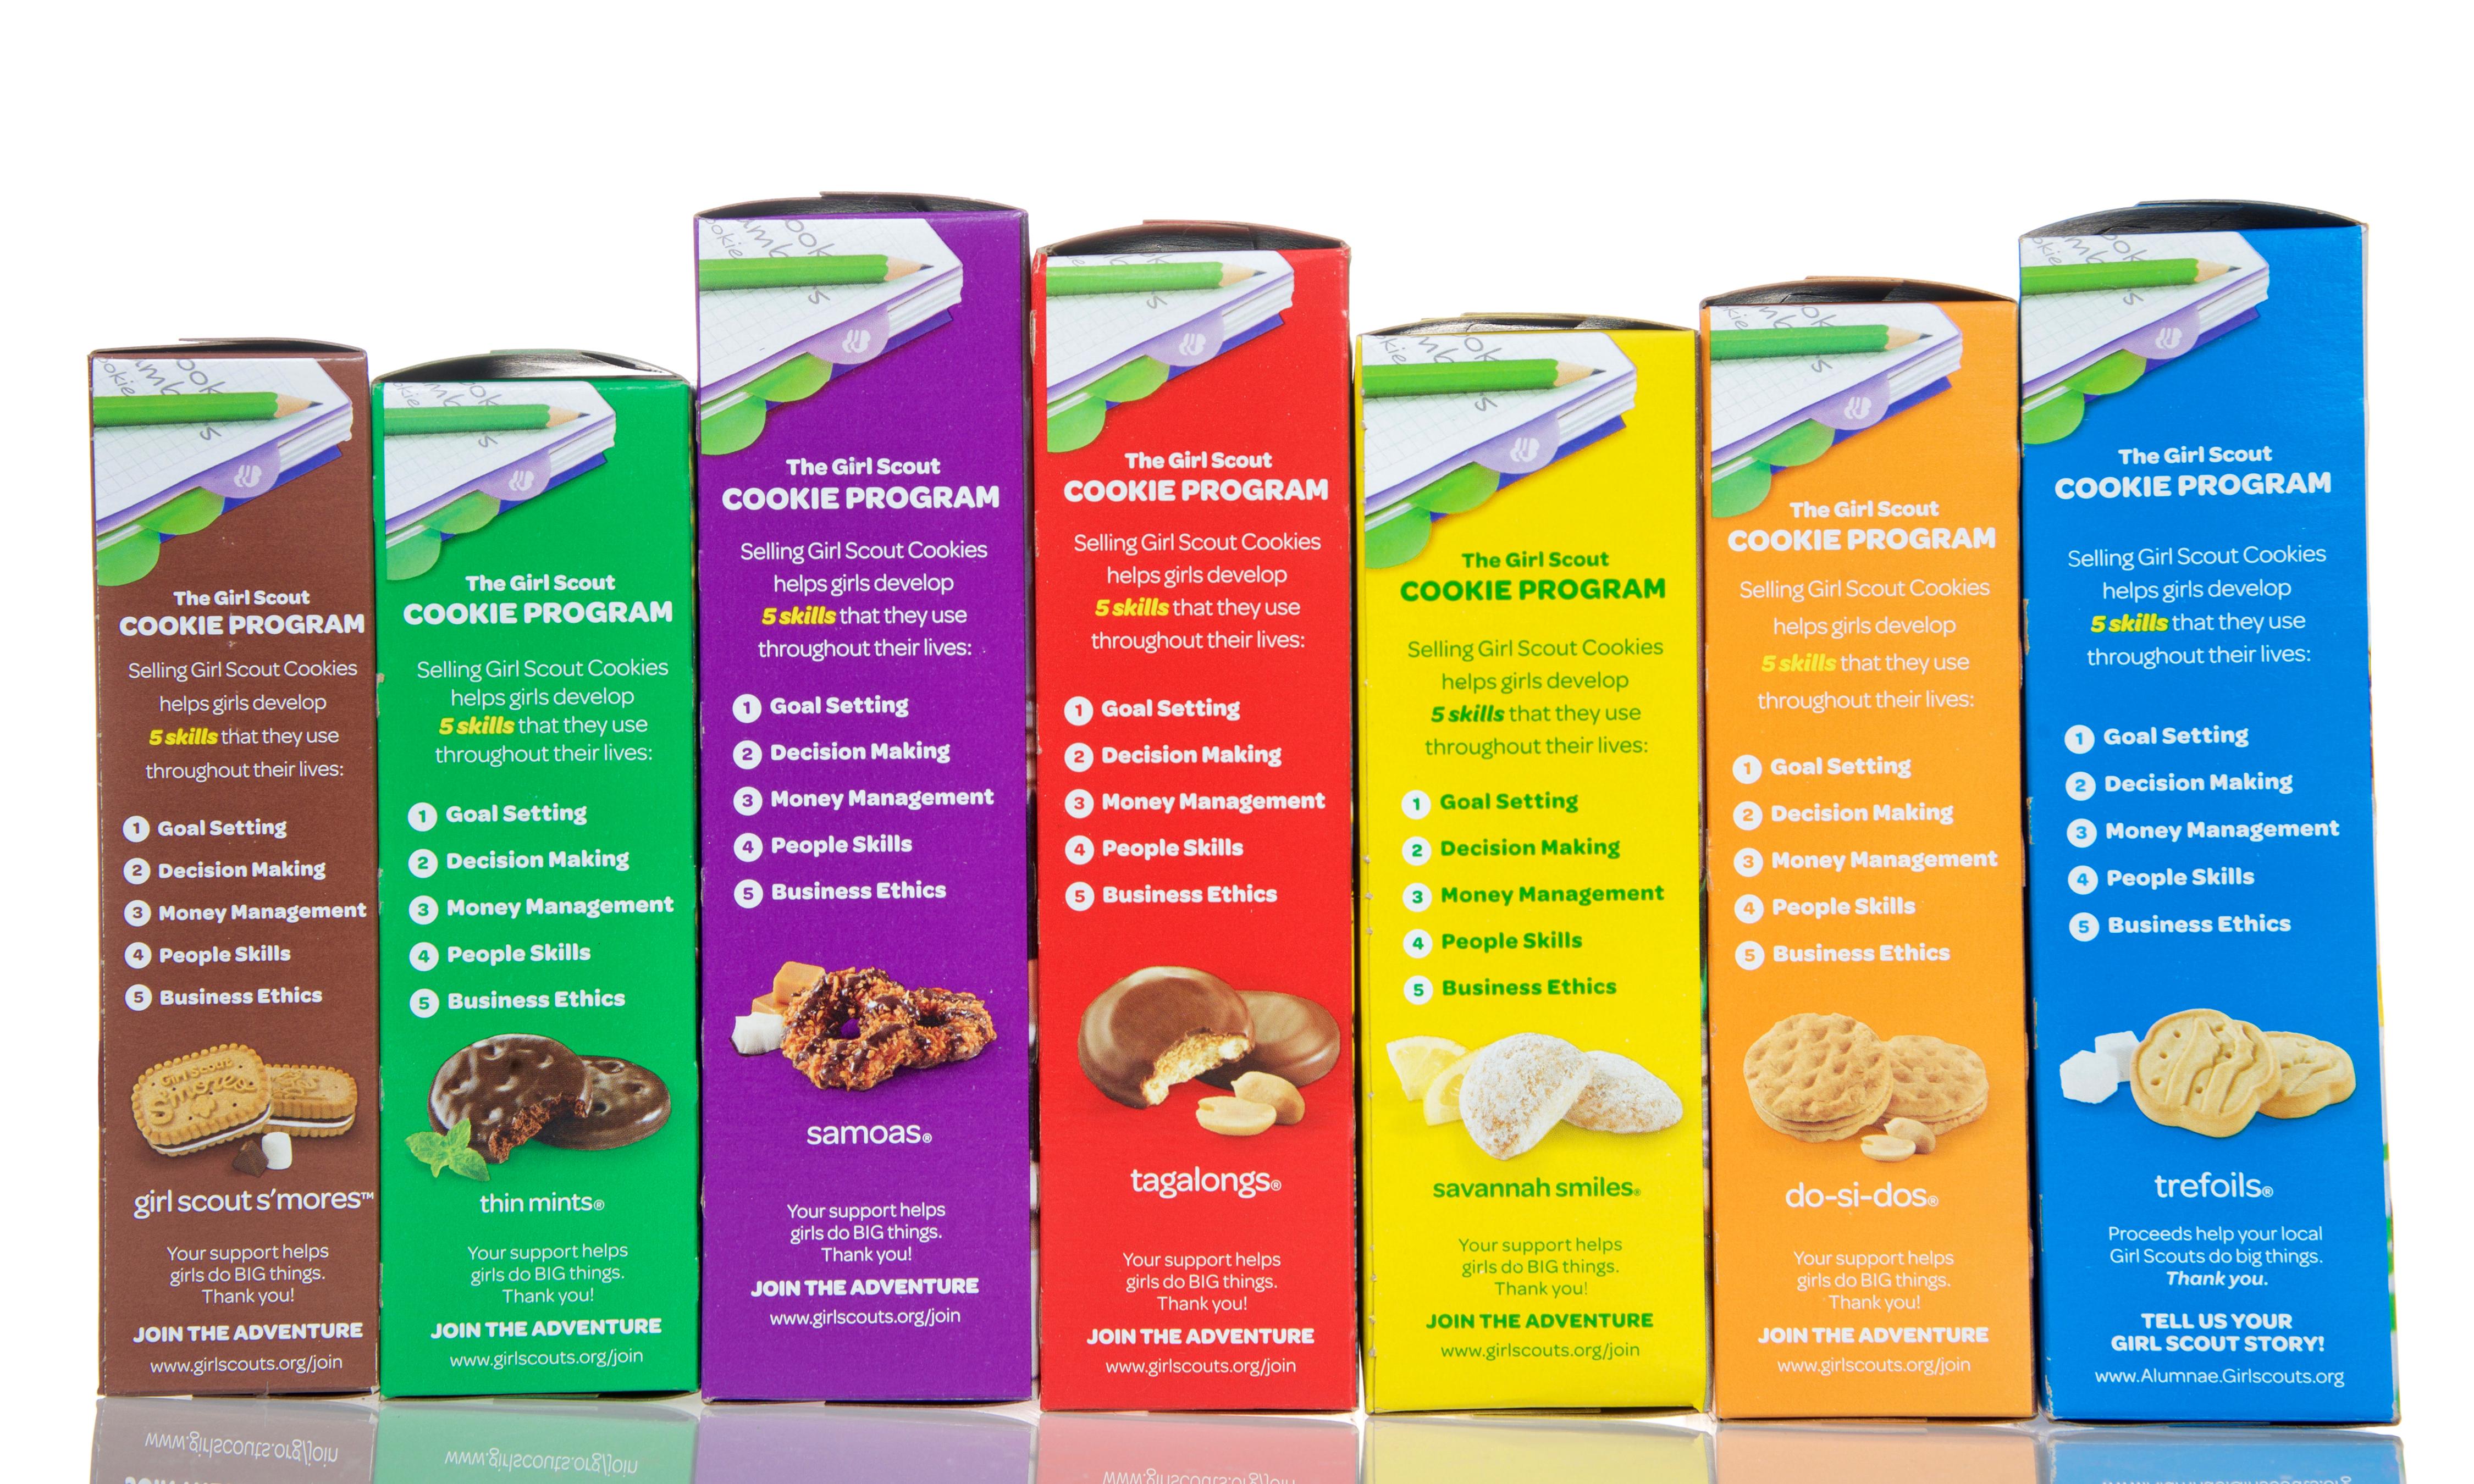 Girl scout cookies per box